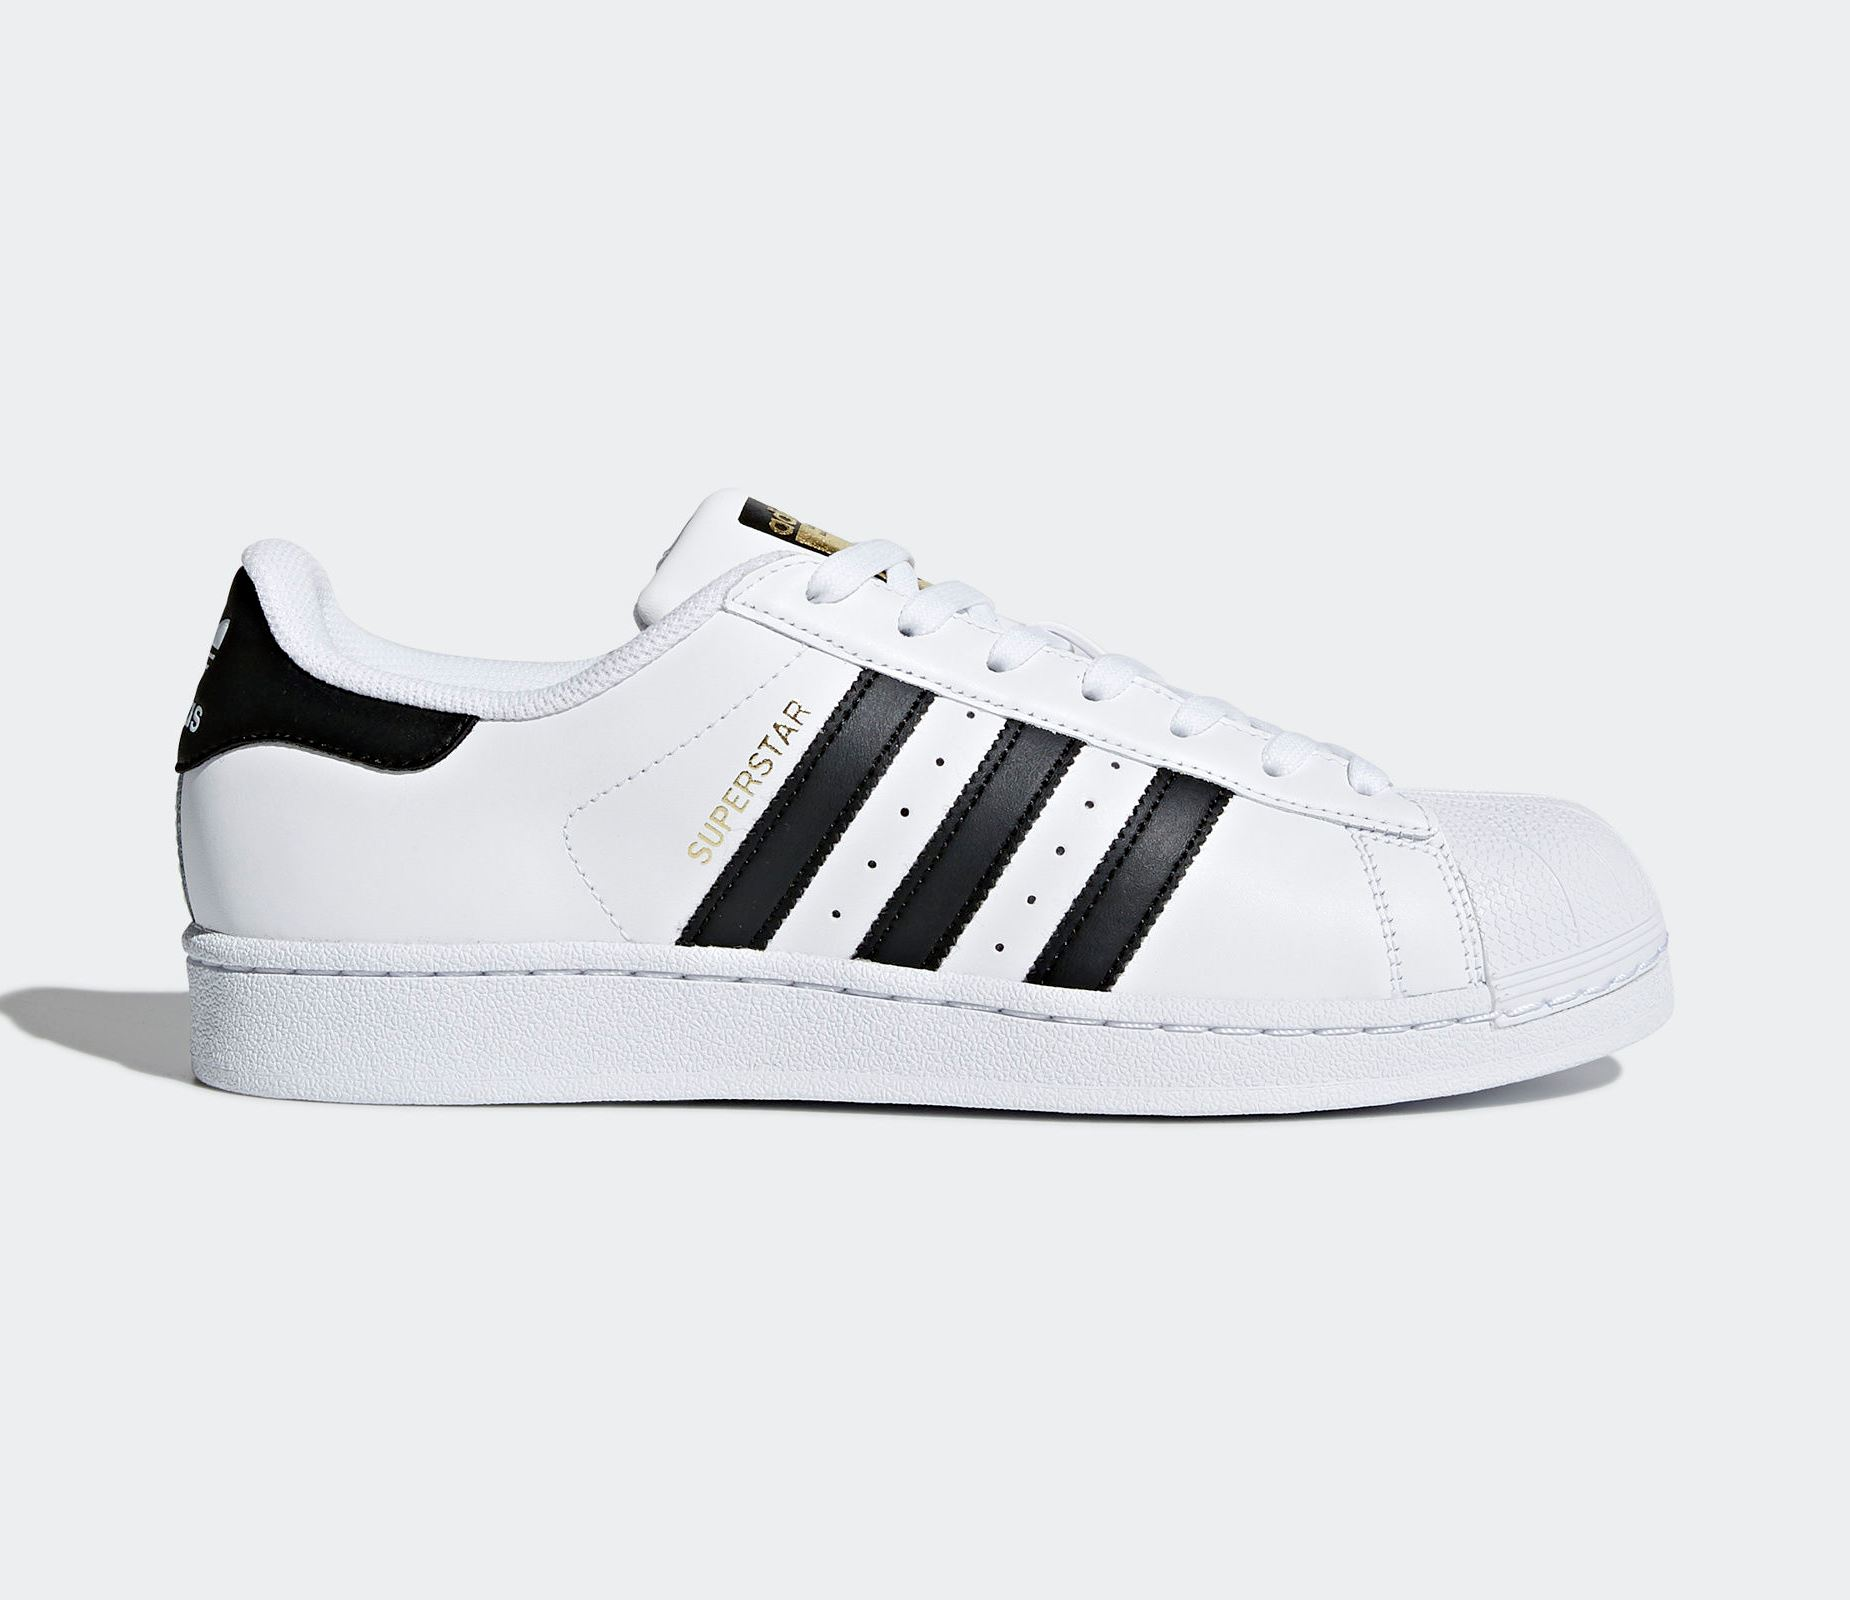 The Tuotteet Originals Athlete's Foot Adidas 0EFRdq0w